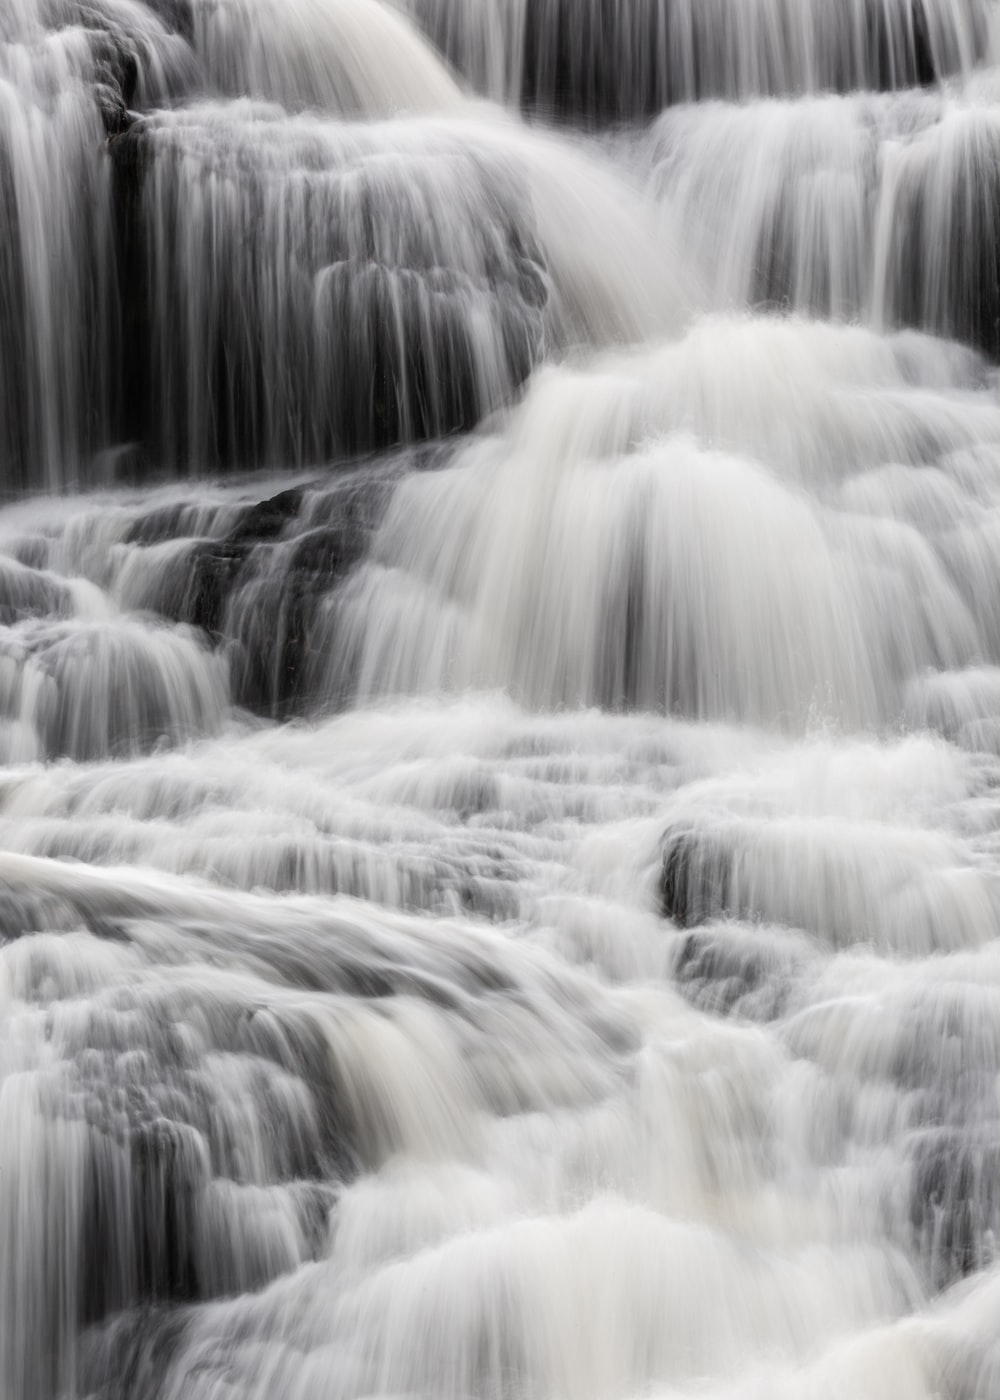 waterfalls and black and gray waterfalls